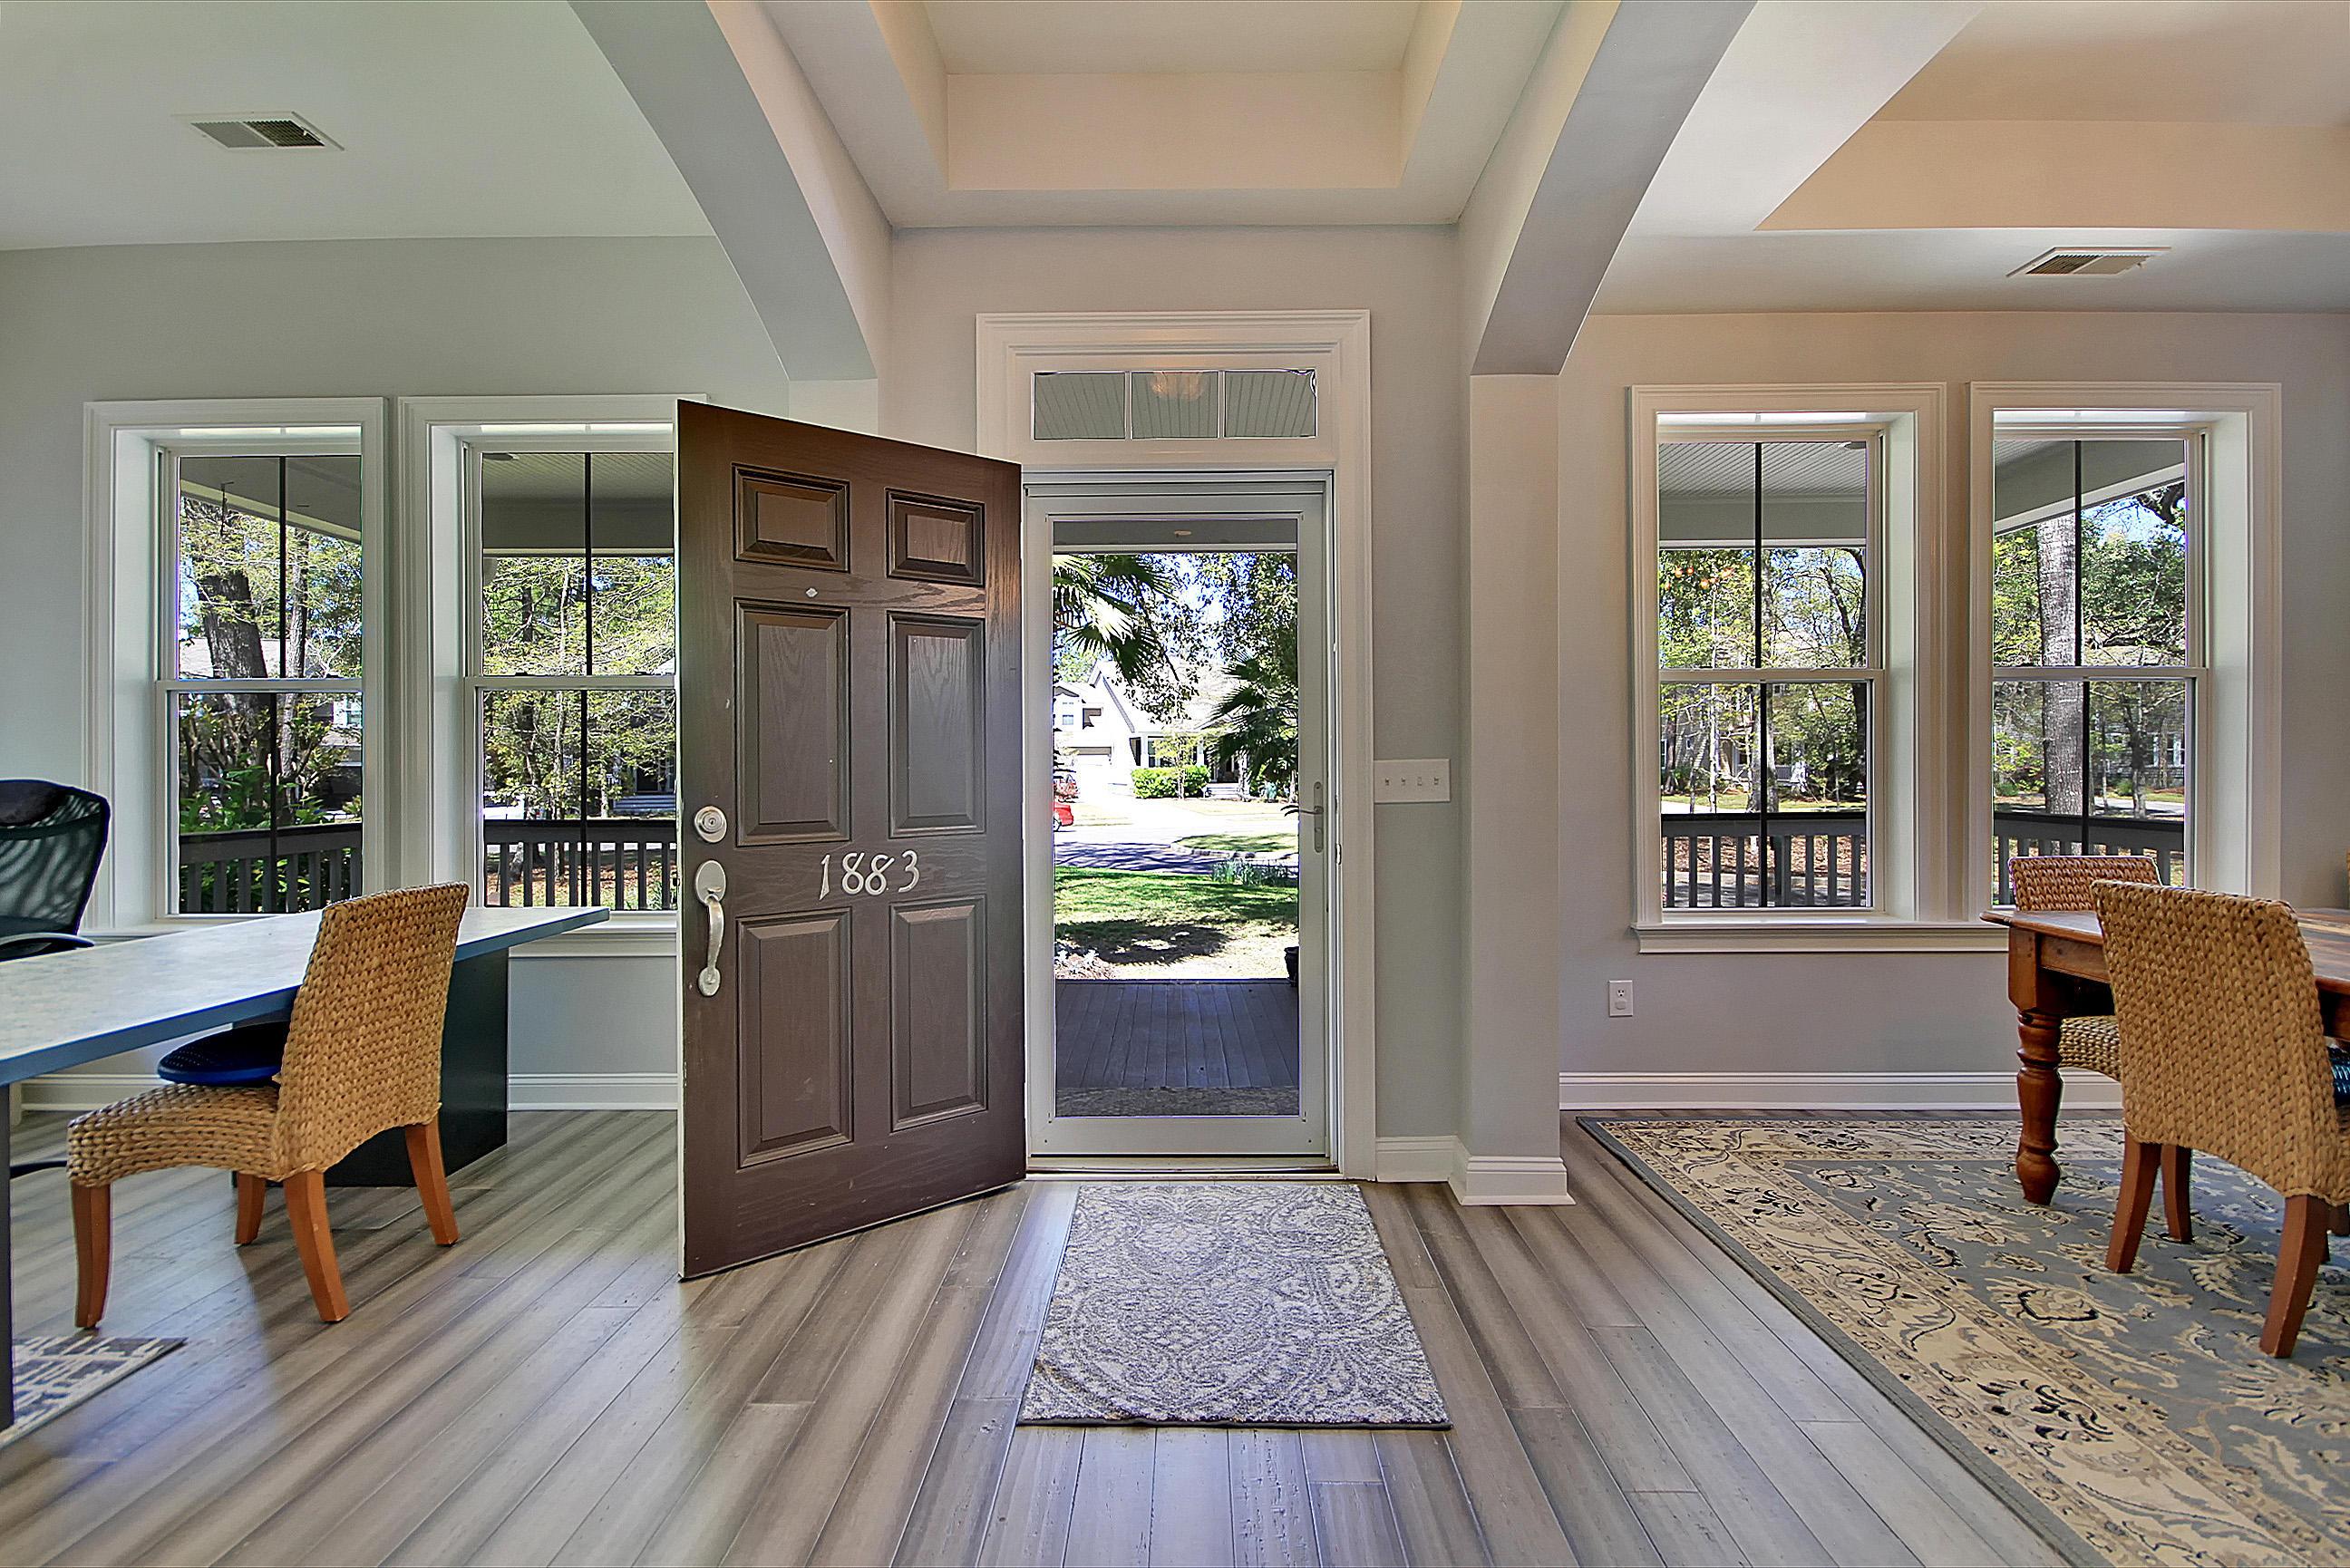 Park West Homes For Sale - 1883 Hall Point, Mount Pleasant, SC - 6